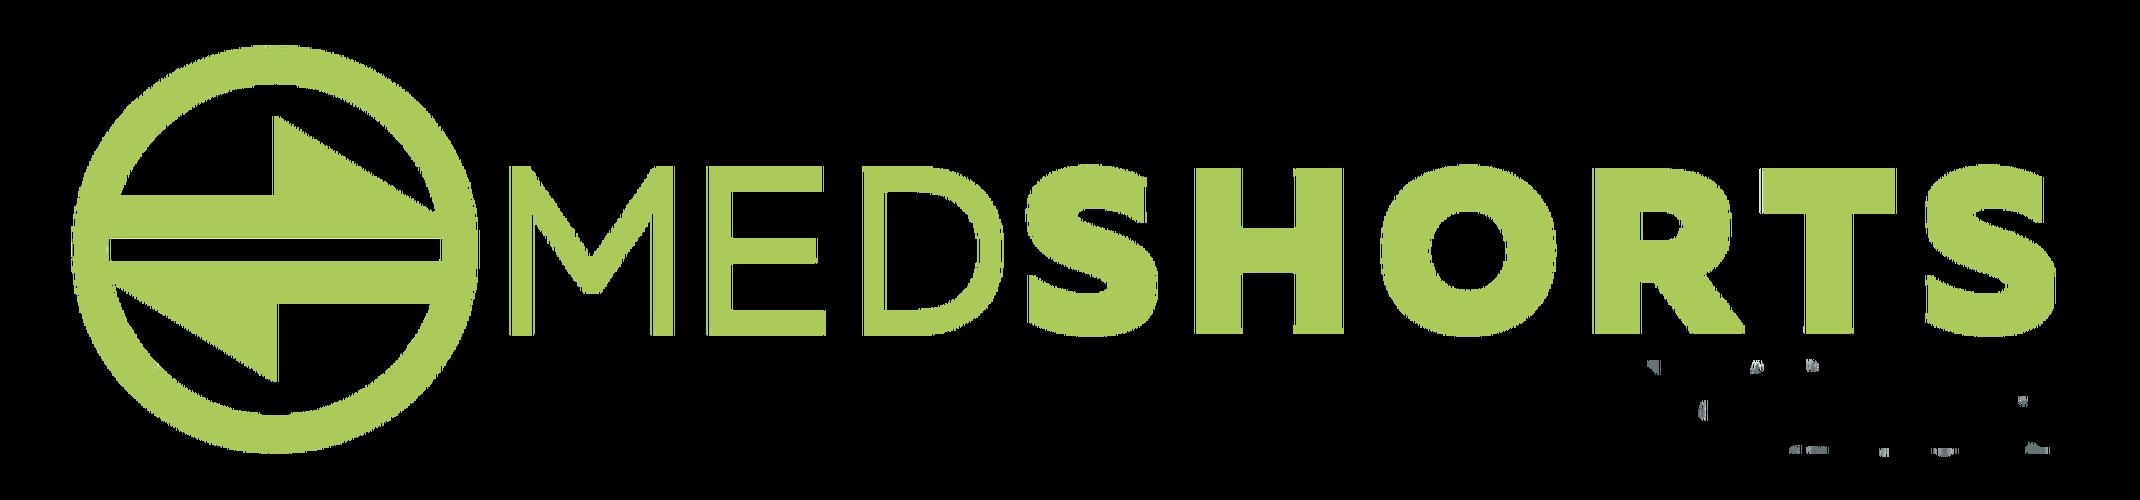 MedShorts